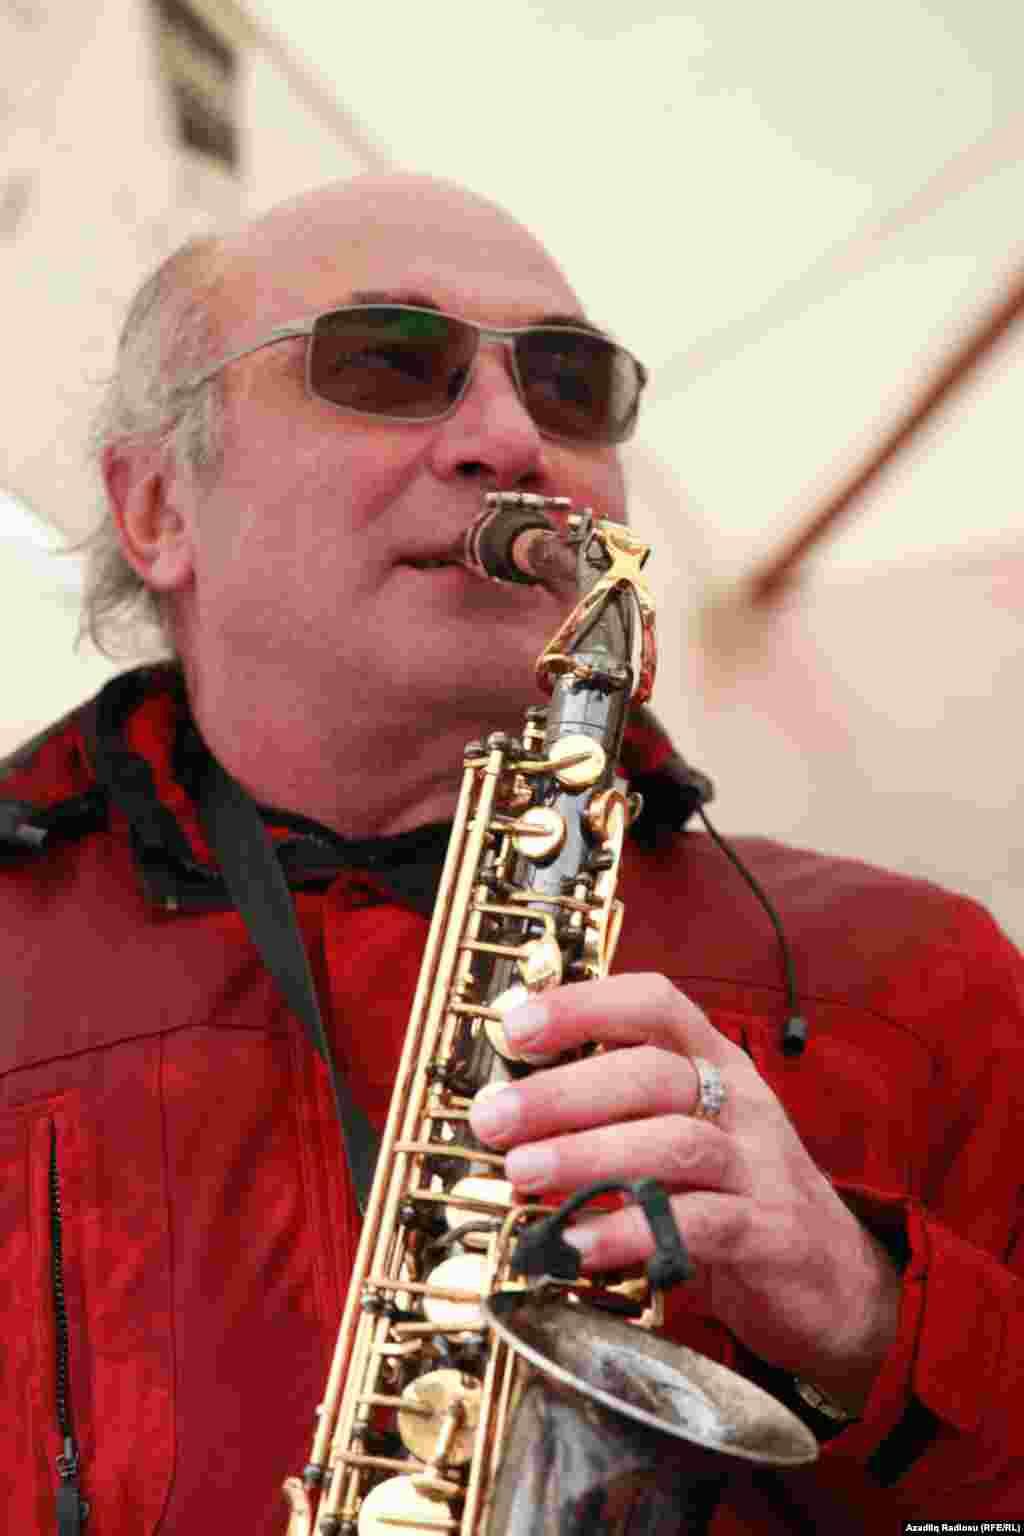 Azerbaijan. Baku. Jazz concert in Baku Vagif Mustafazade